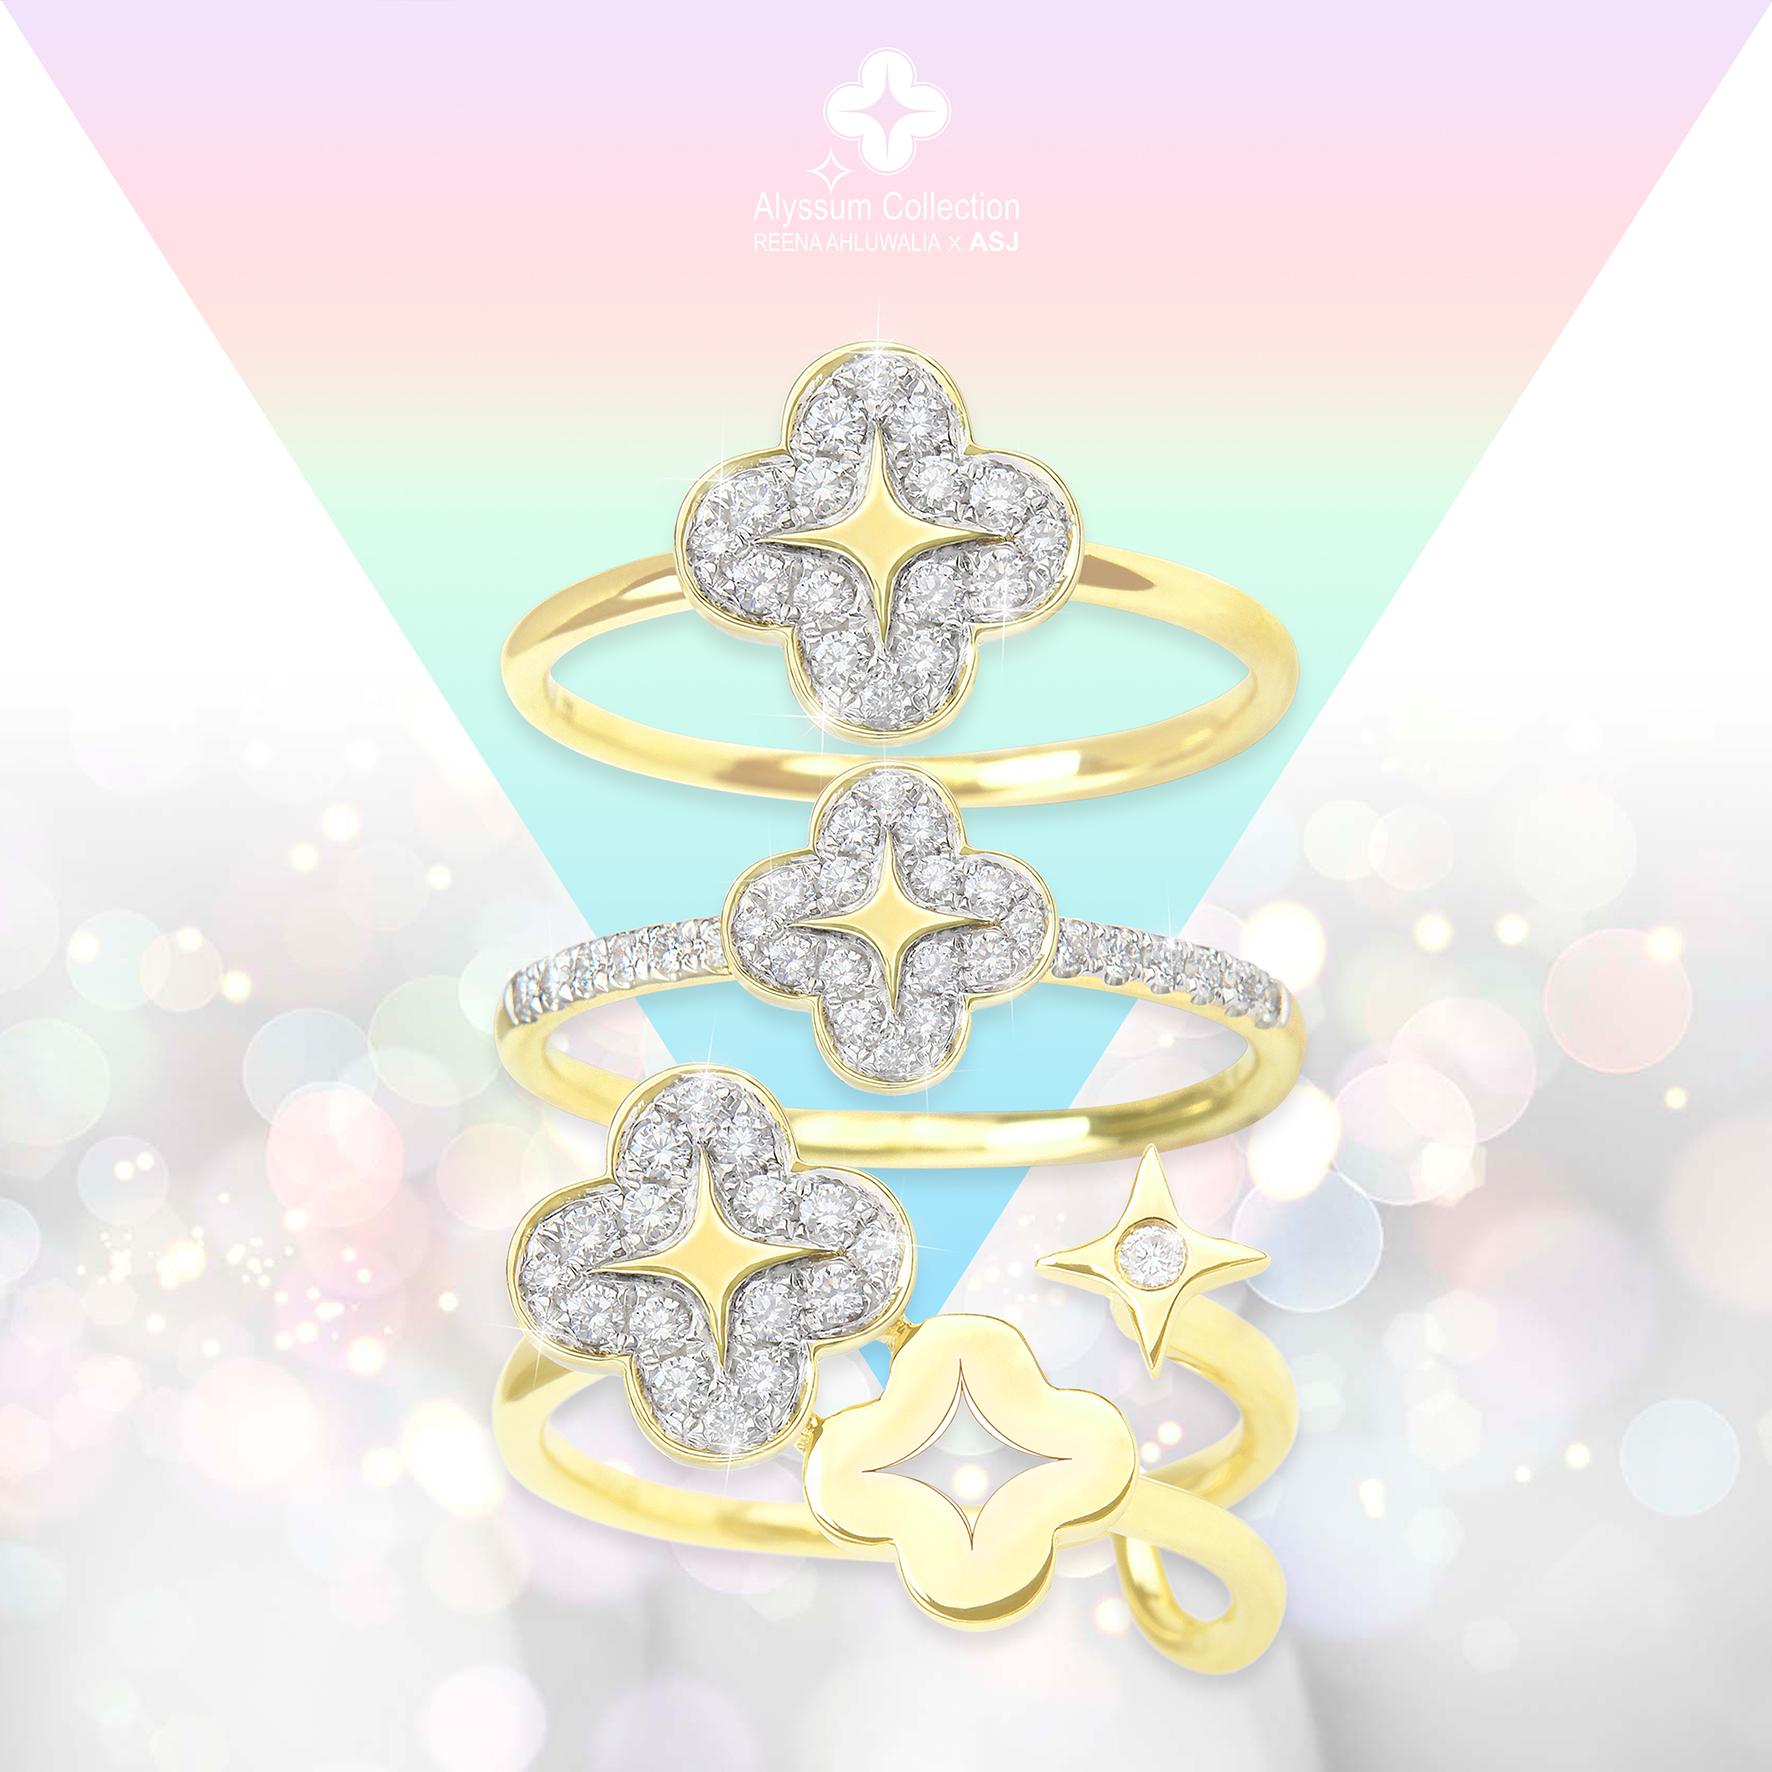 2Alyssum By Reena Ahluwalia_Diamonds_Gold_Collection.jpg